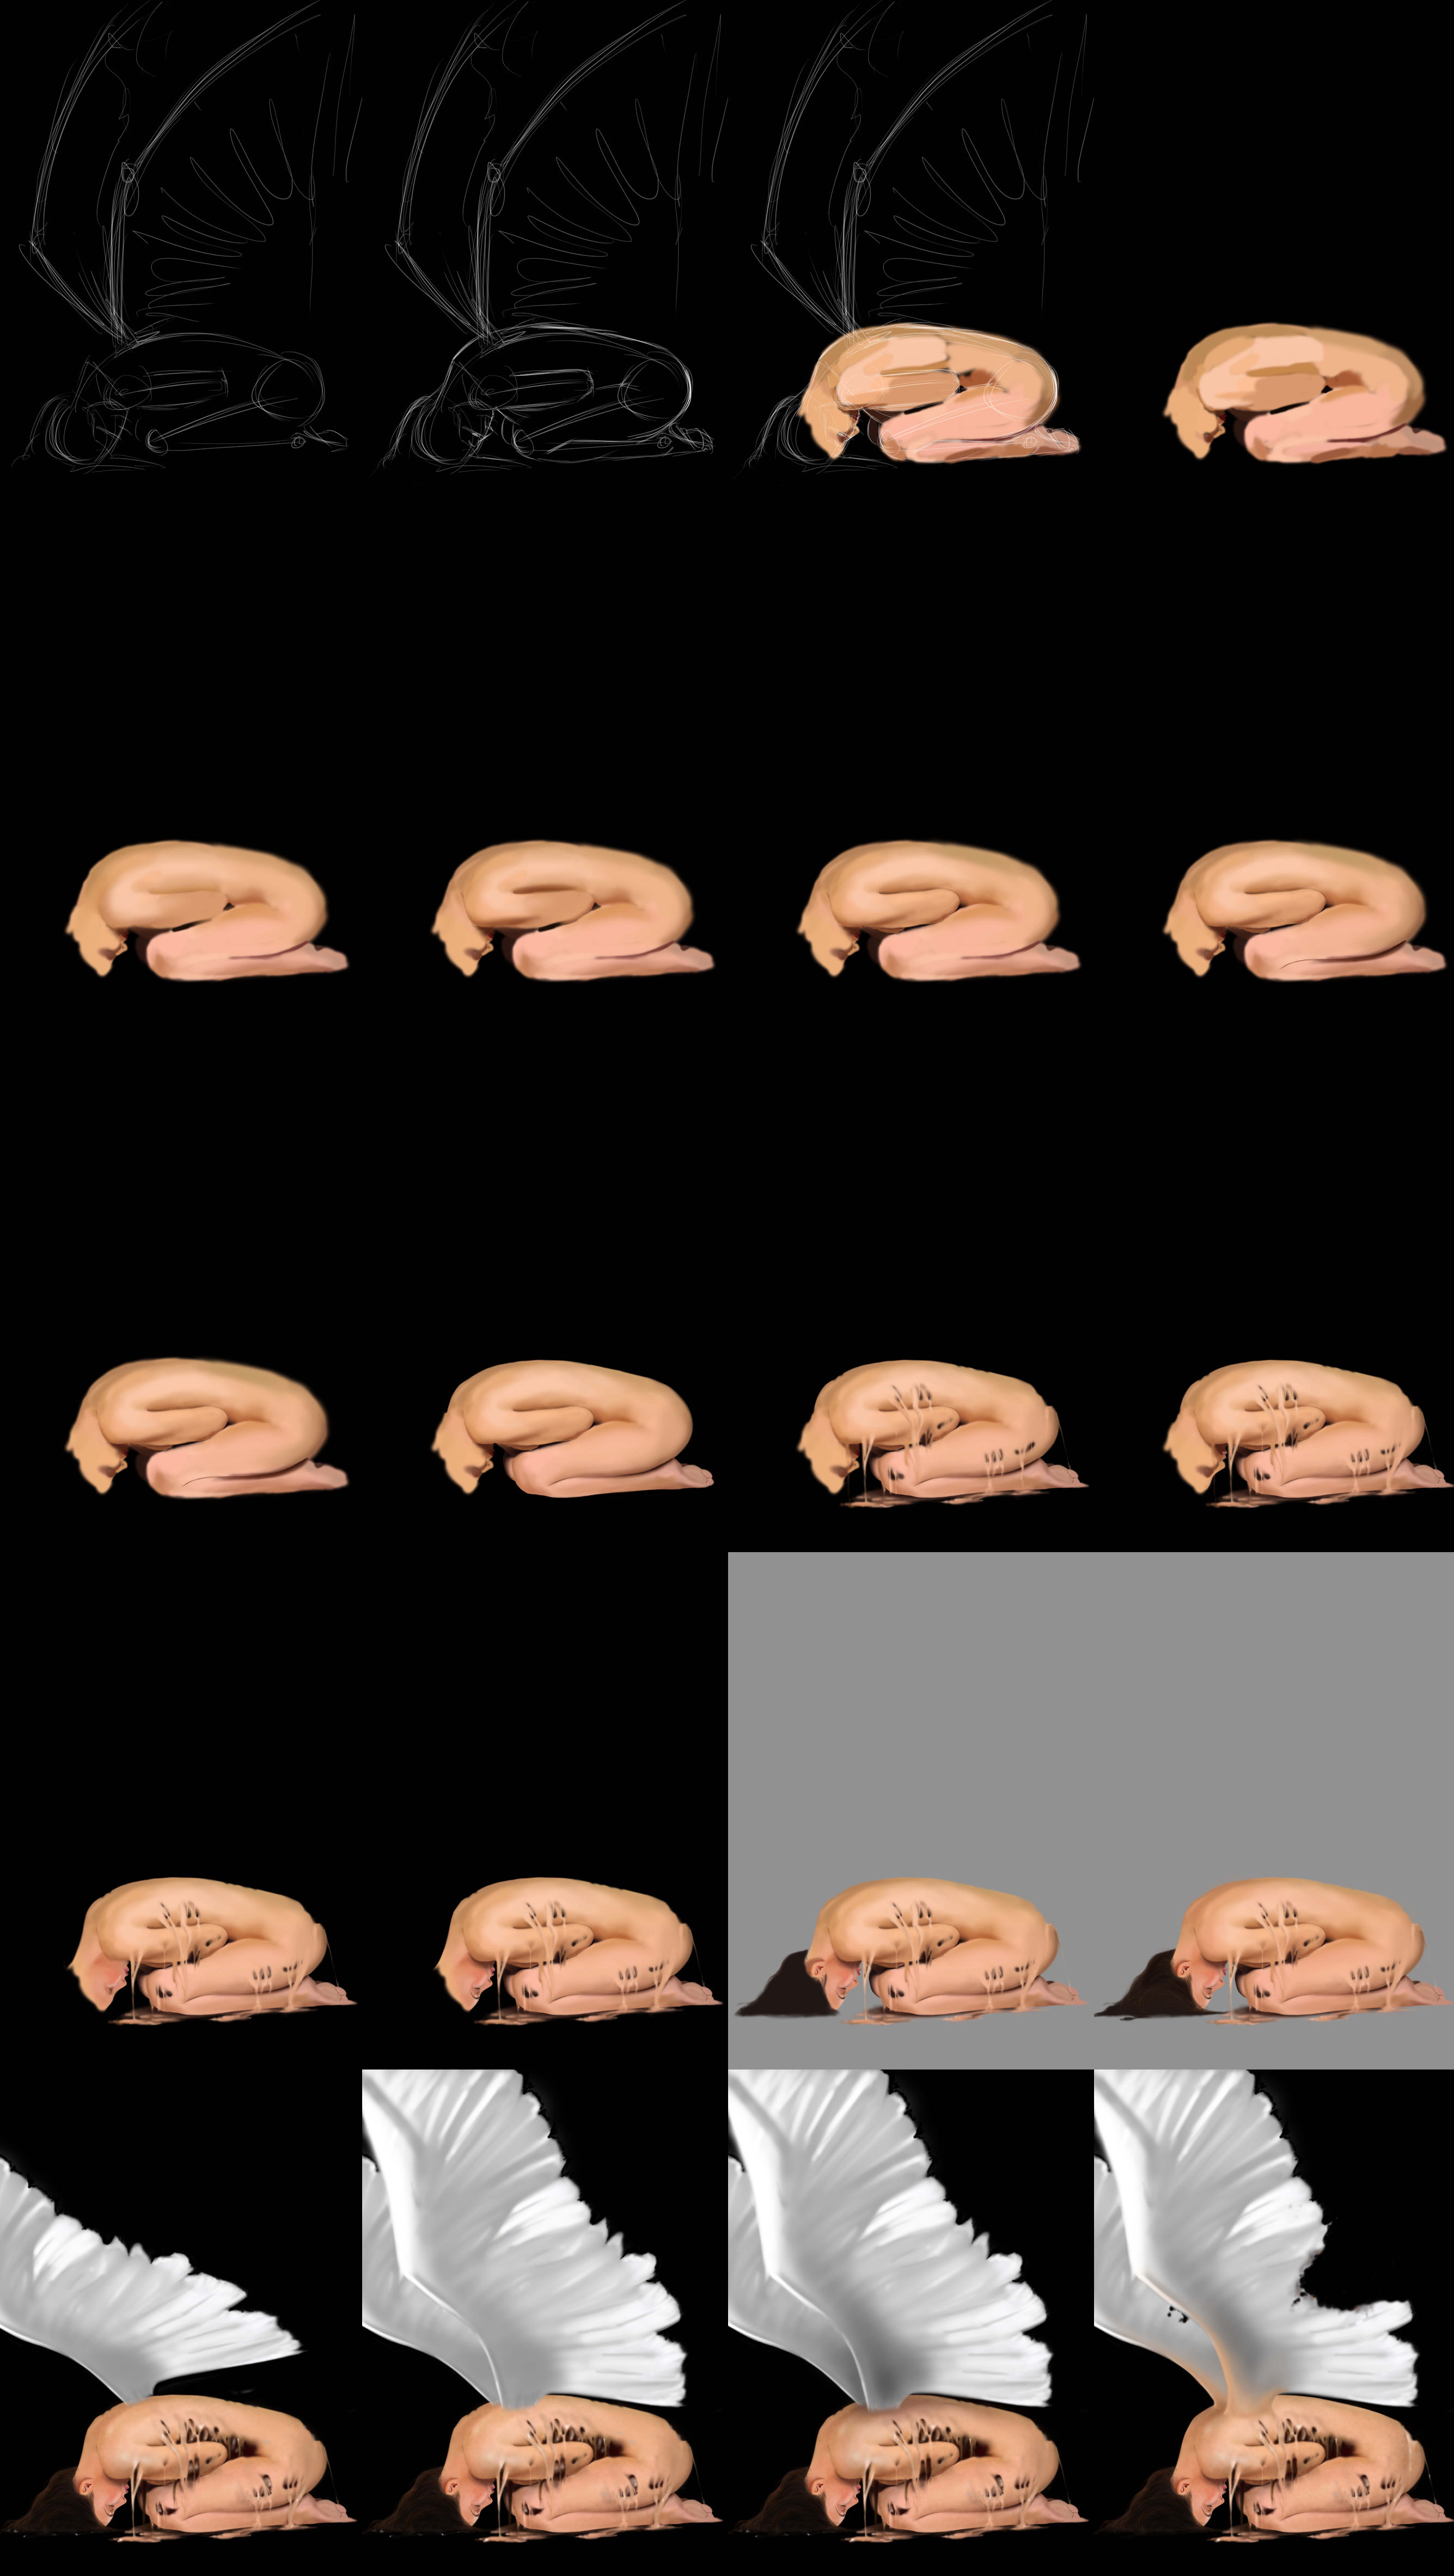 Blending skin tutorial of a Fallen Angel by jht888